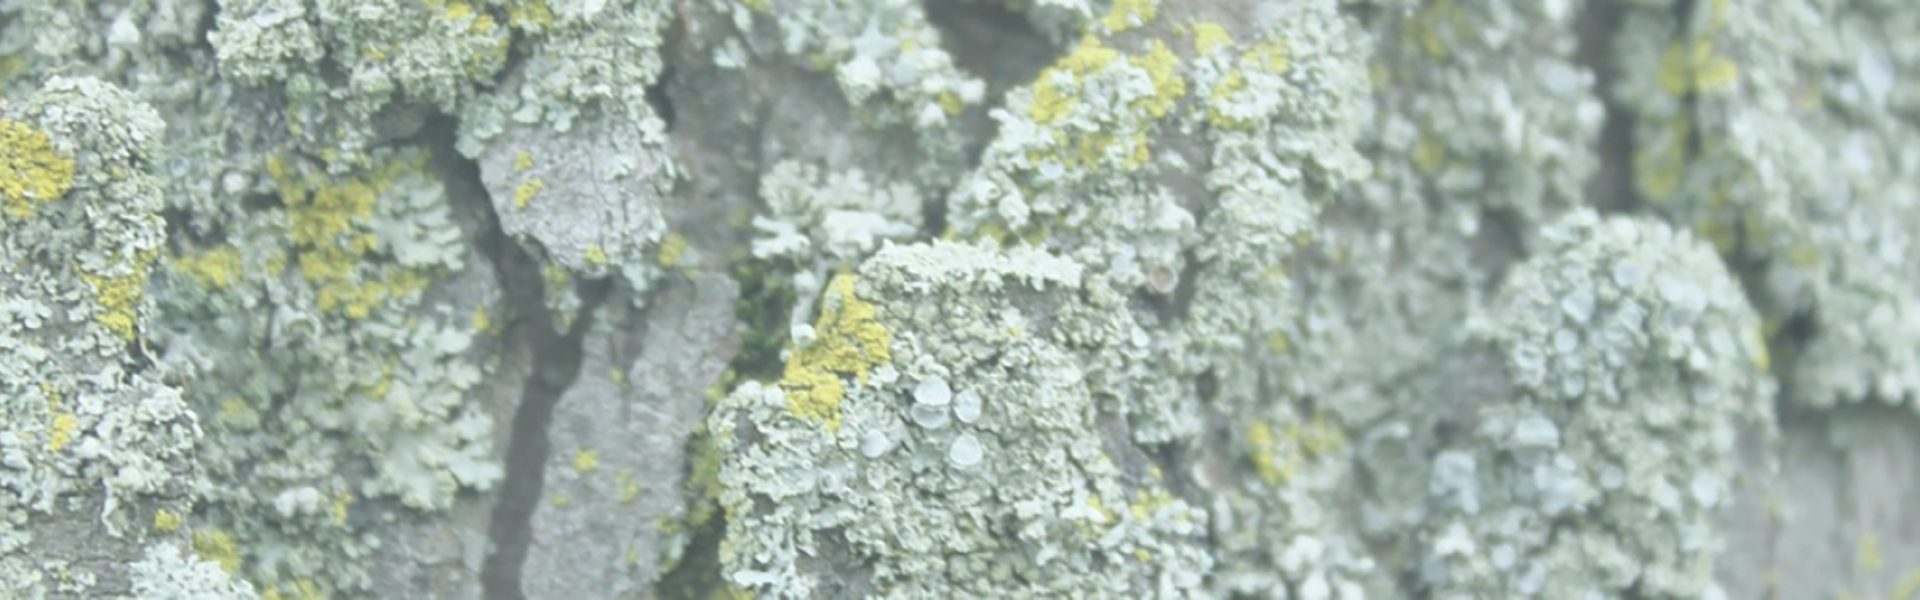 banner_slice-of-lichen-on-treebark-1-orig.20210524135724.jpg